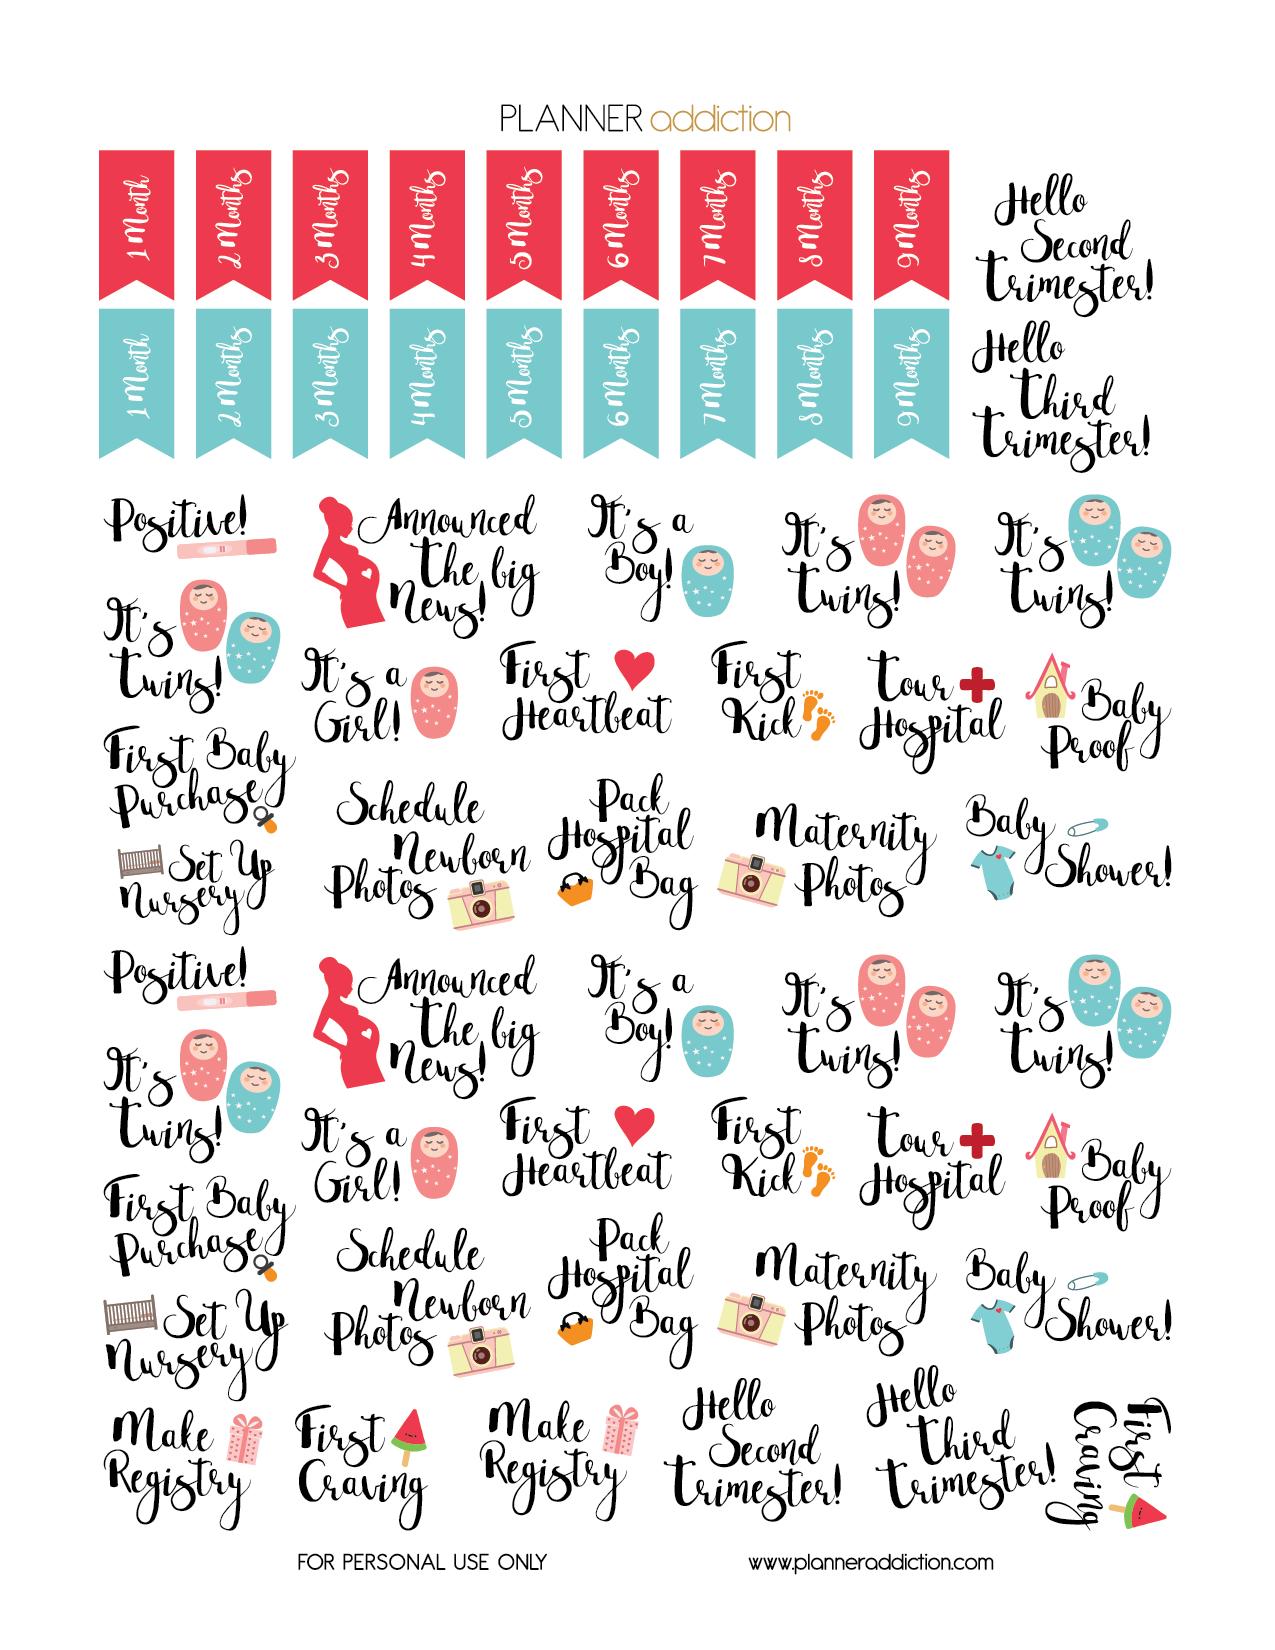 Free Printable Planner Stickers - Pregnancyplanner